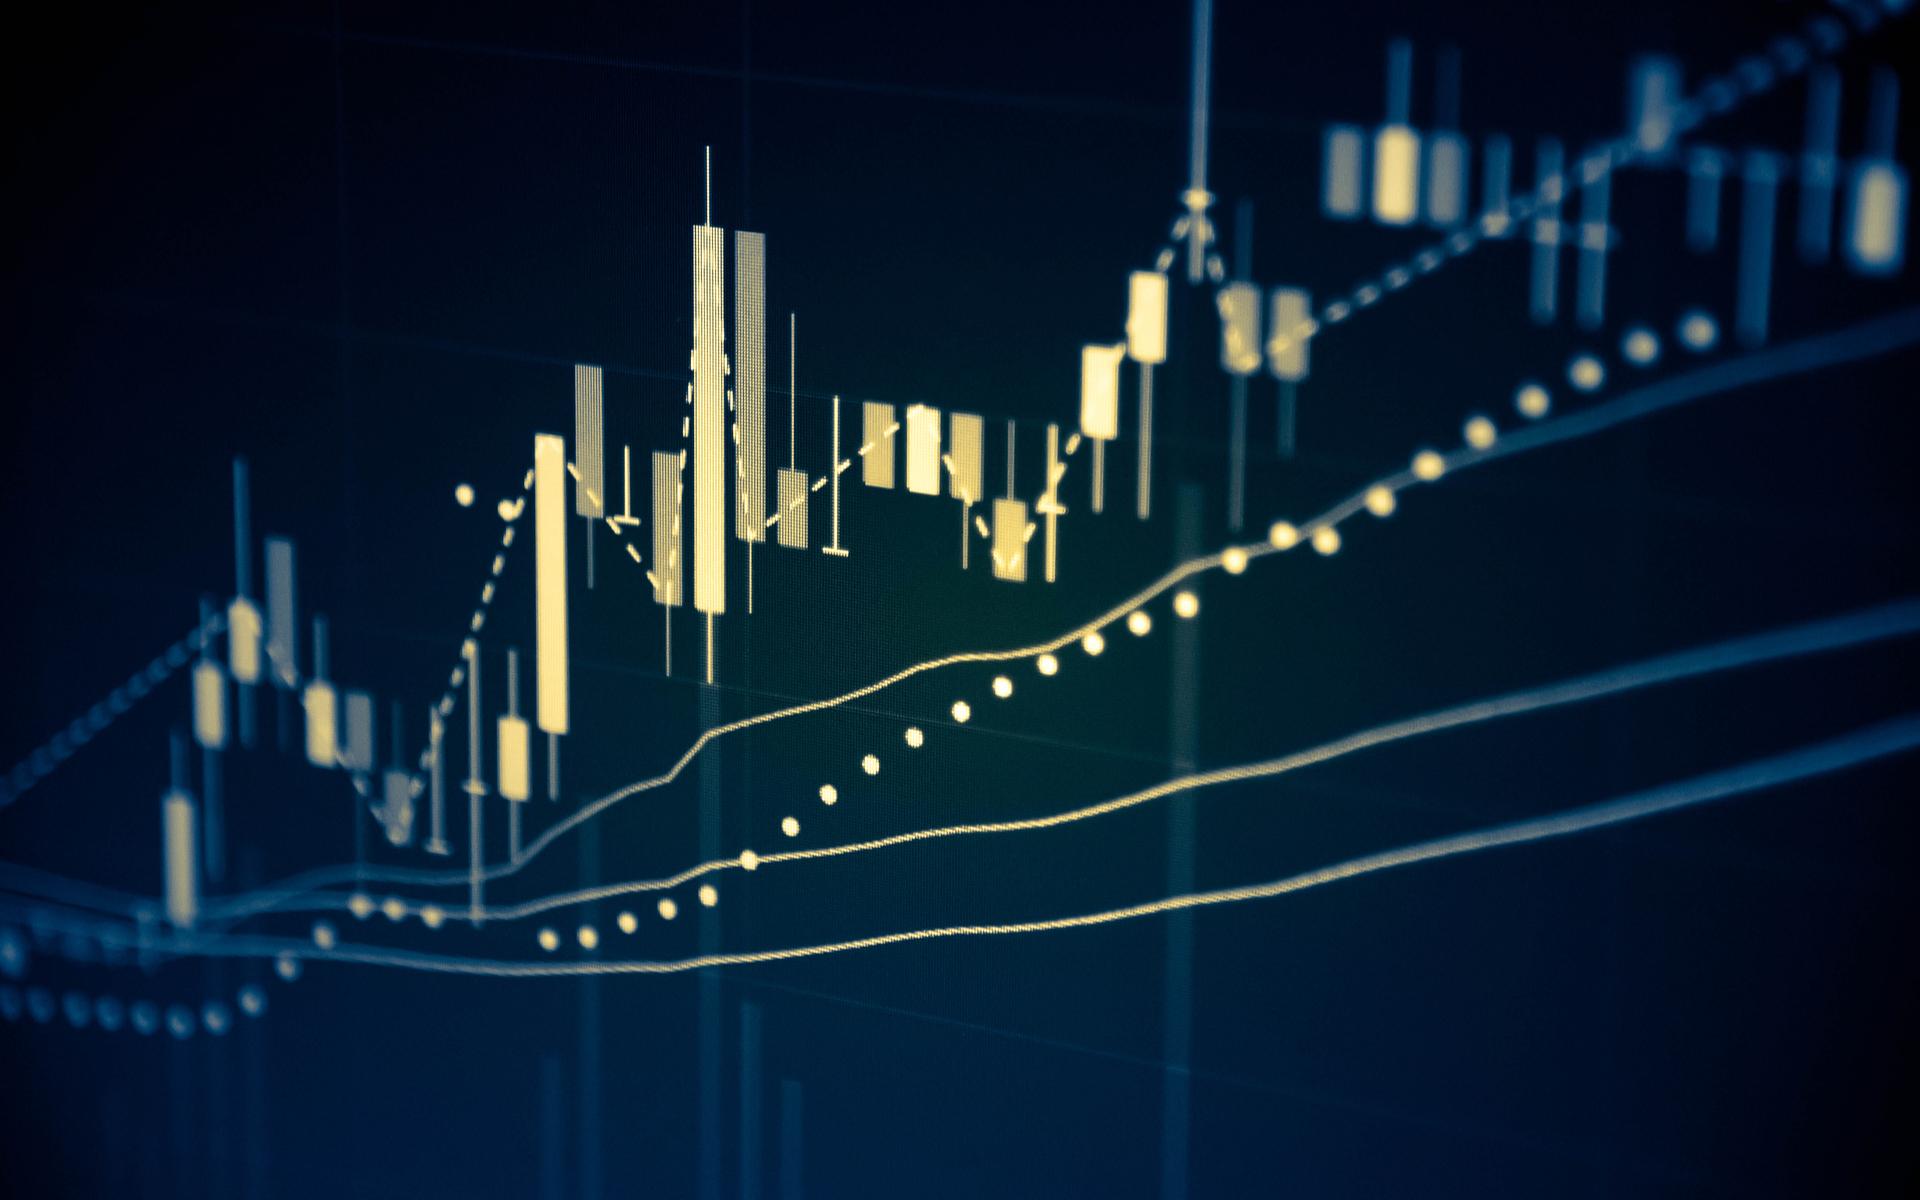 MVRV Bitcoin indicator